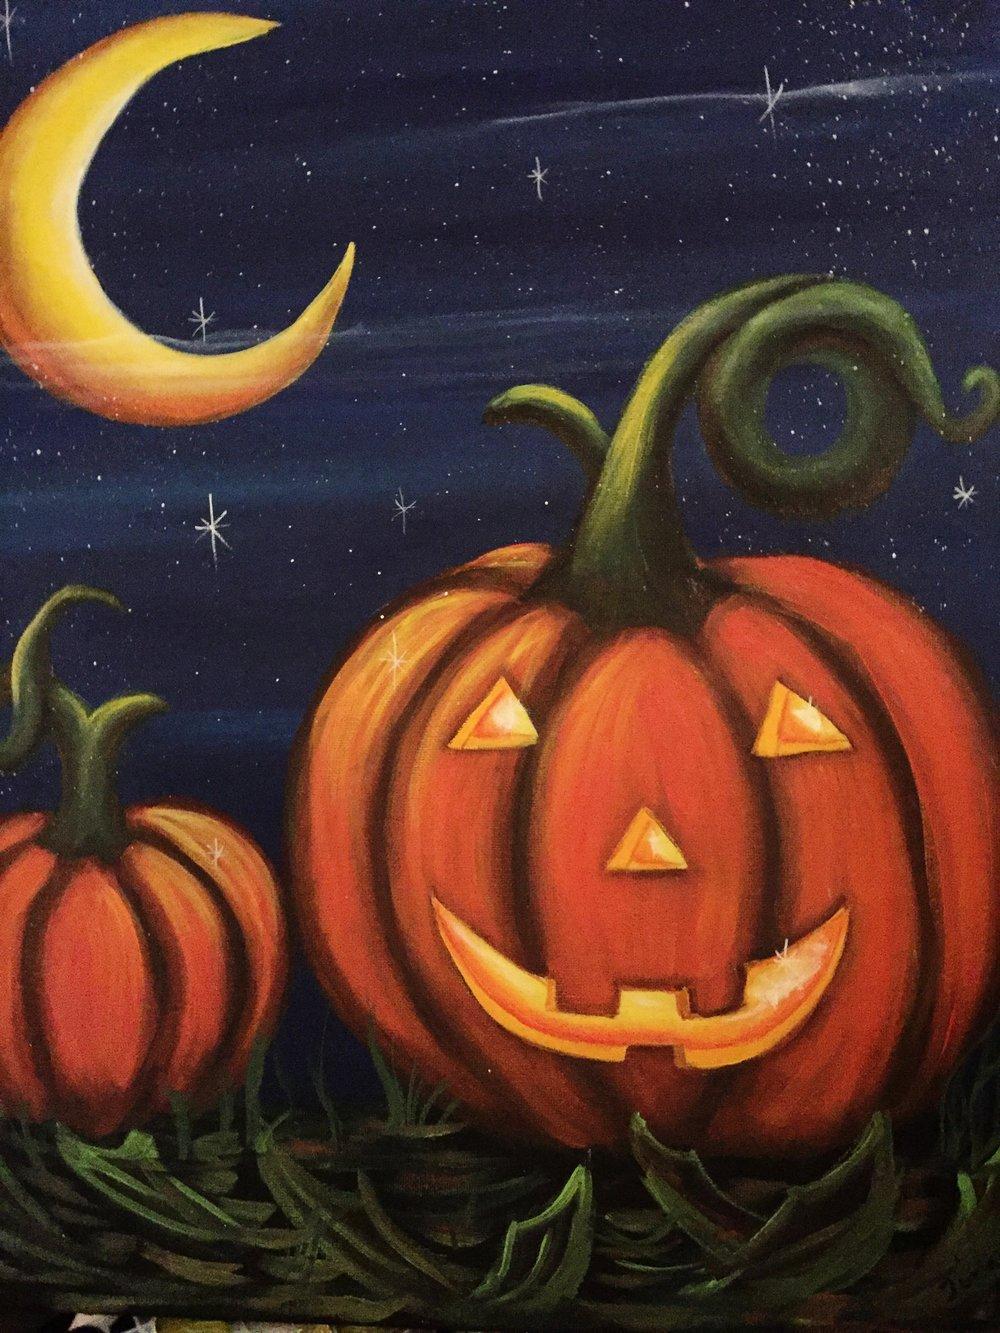 http://www.tintedhues.com/shop/pumpkin-night